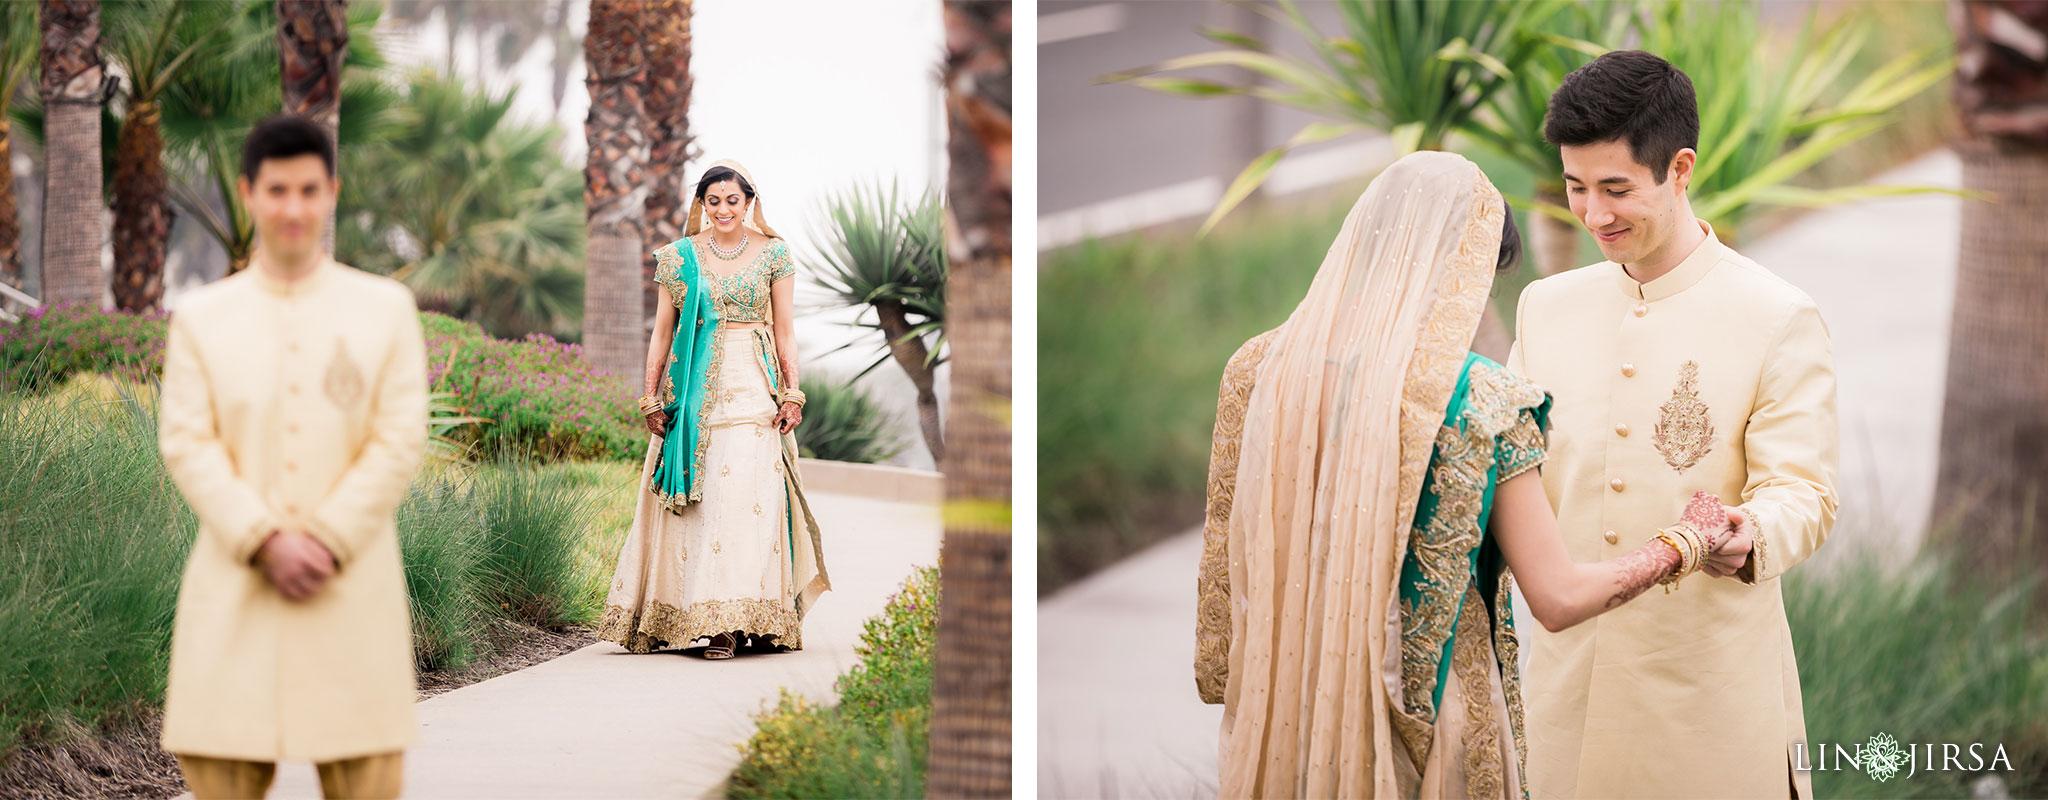 11 pasea hotel and spa huntington beach indian wedding photography